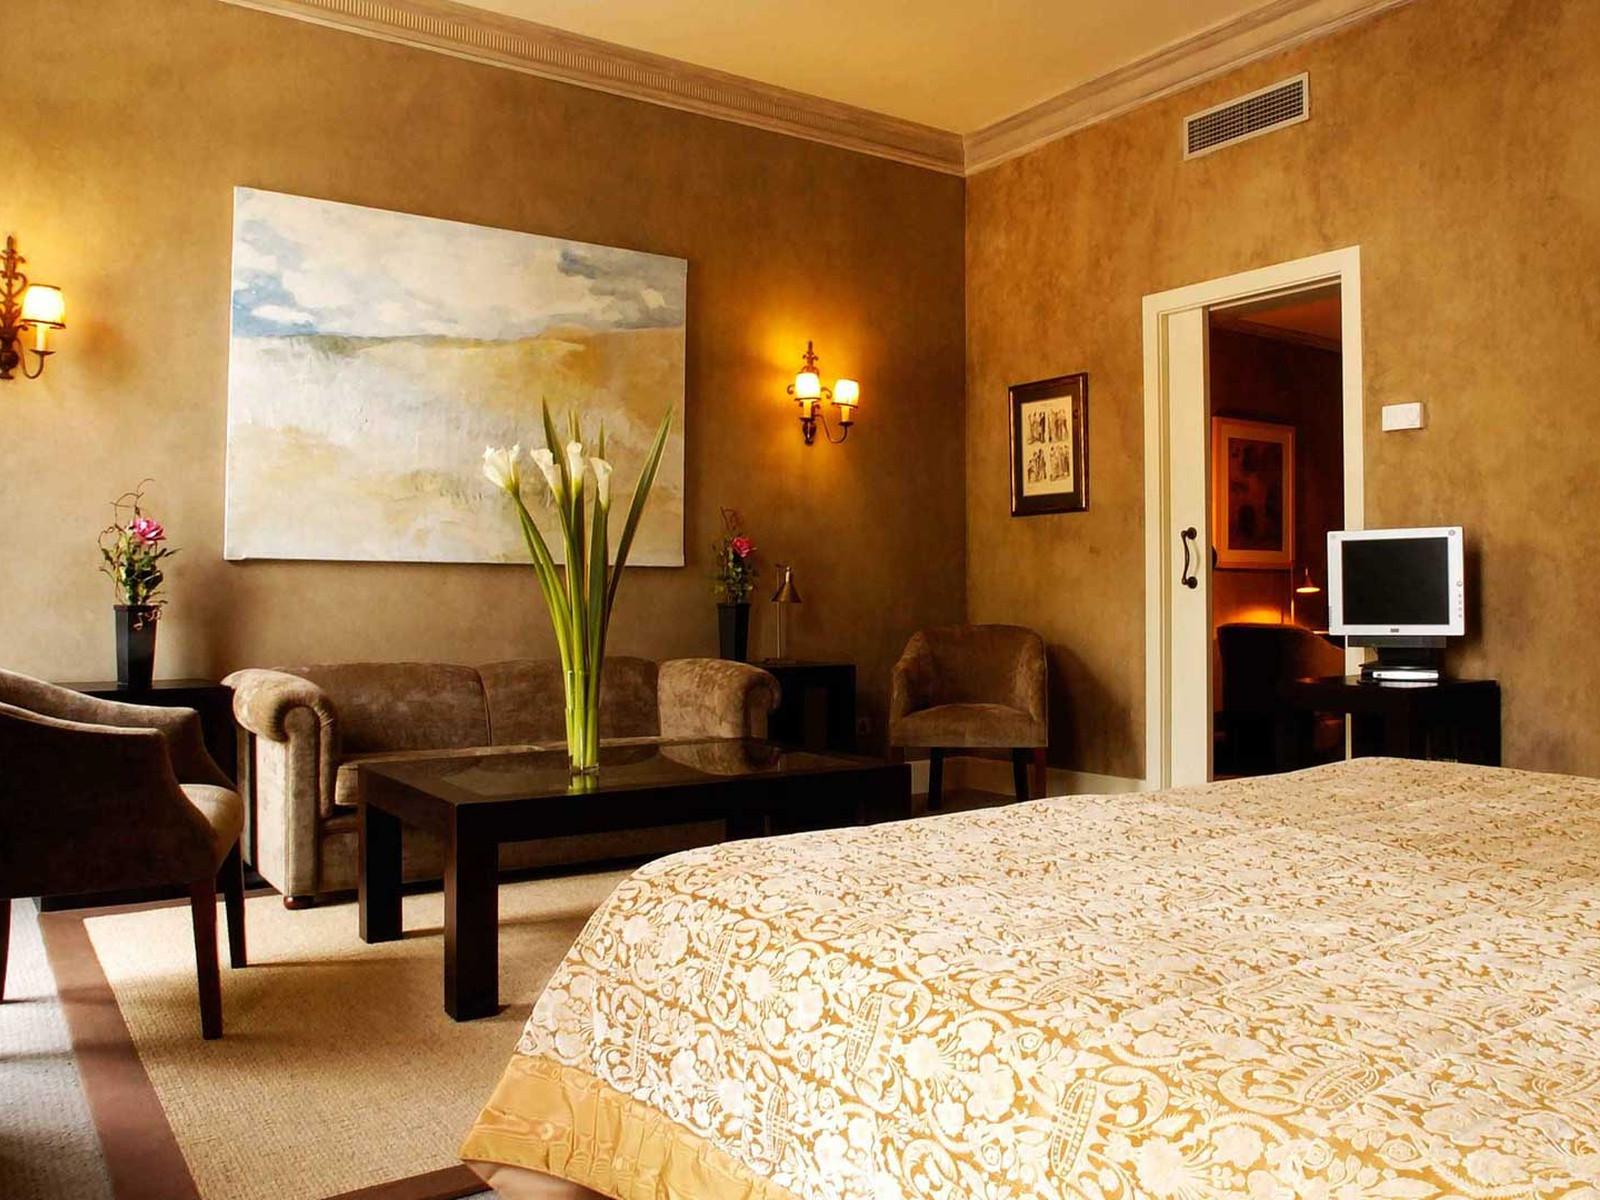 tipp ein g nstiges hotel finden. Black Bedroom Furniture Sets. Home Design Ideas